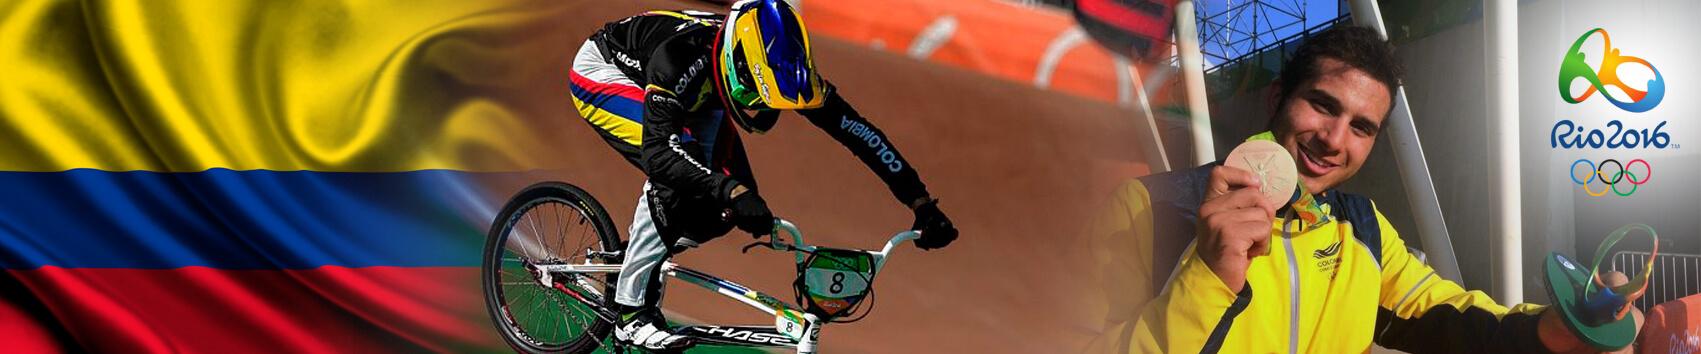 carlos-ramirez-olympic-interview-fifteen-bmx